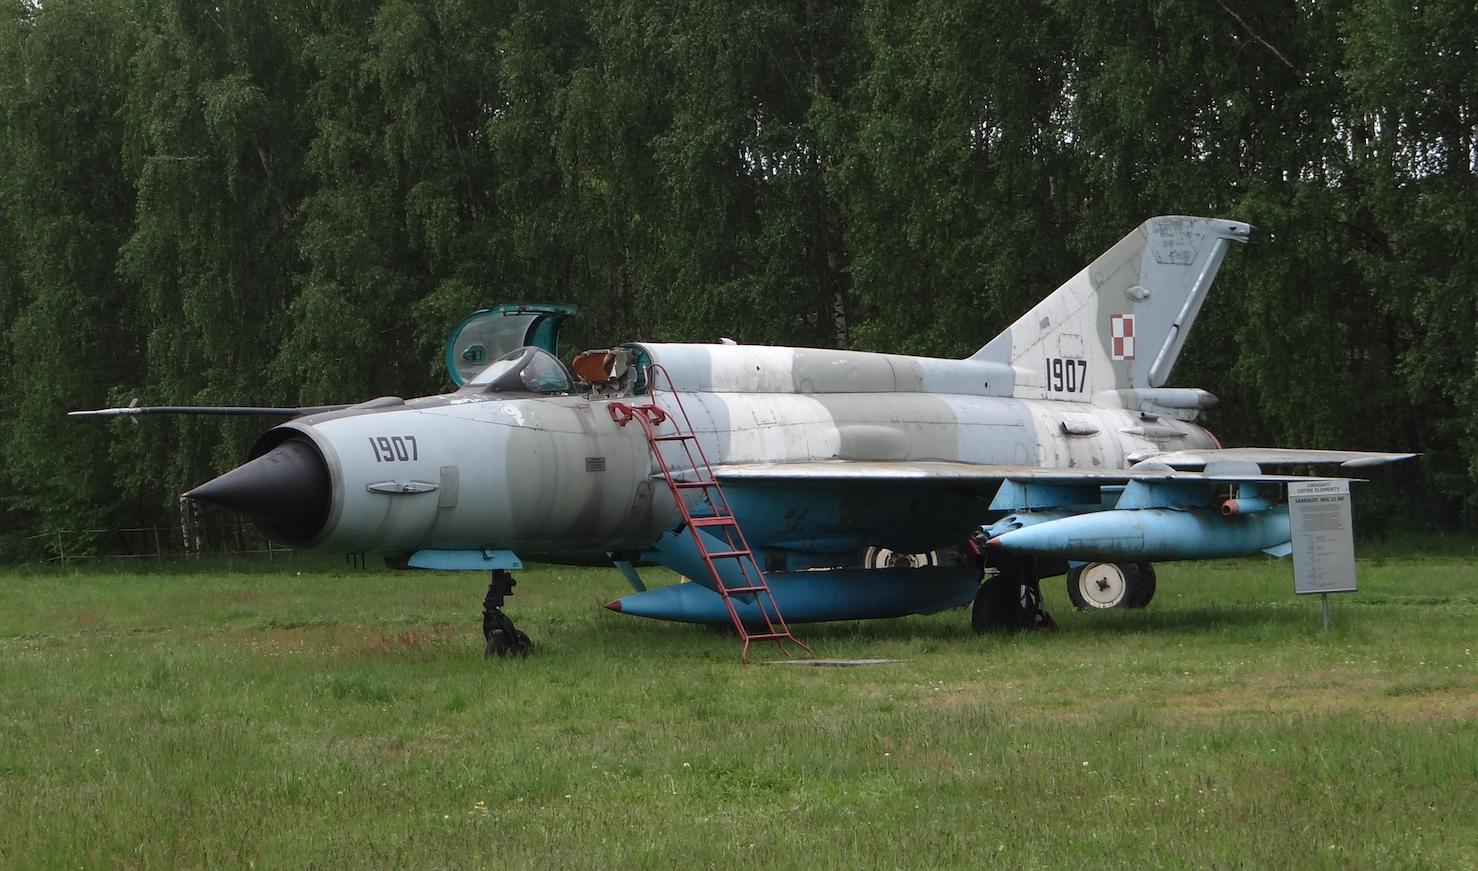 MiG-21 M nb 1907. 2021 rok. Zdjęcie Karol Placha Hetman